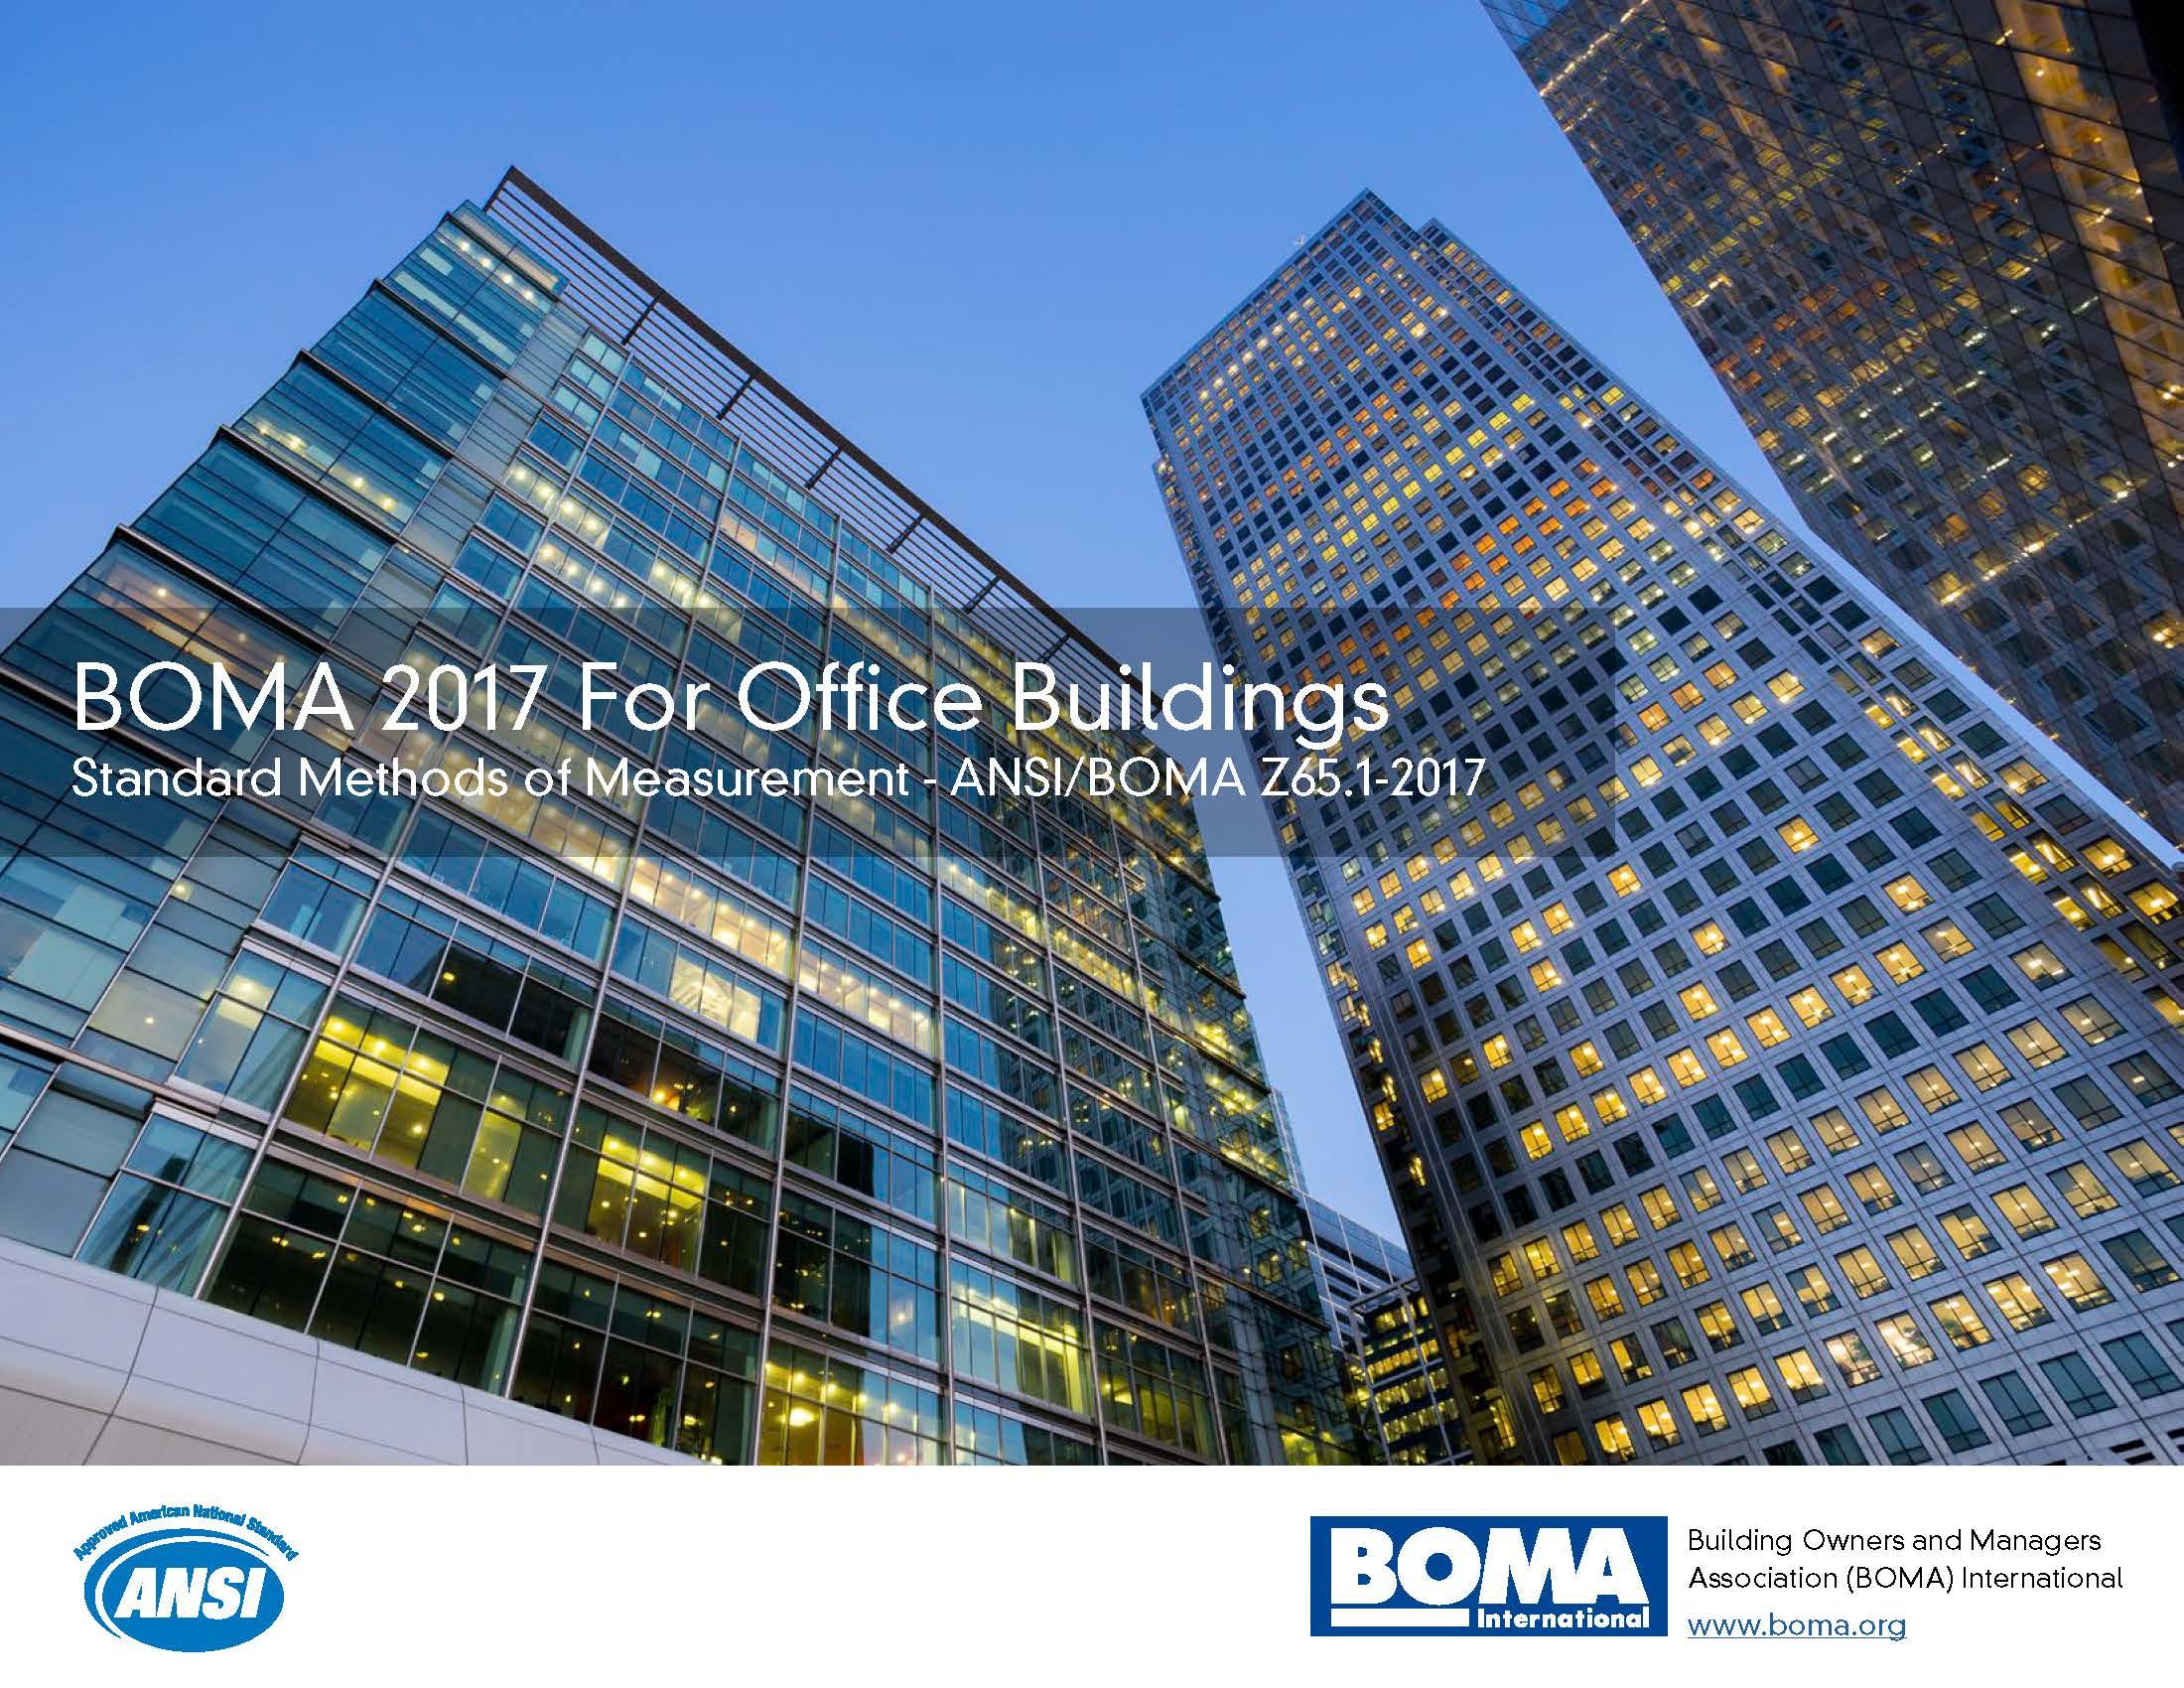 Boma 2010 Spreadsheet For Office Buildings Boma 2010 Spreadsheet Printable Spreadshee Printable Spreadshee boma 2010 spreadsheet